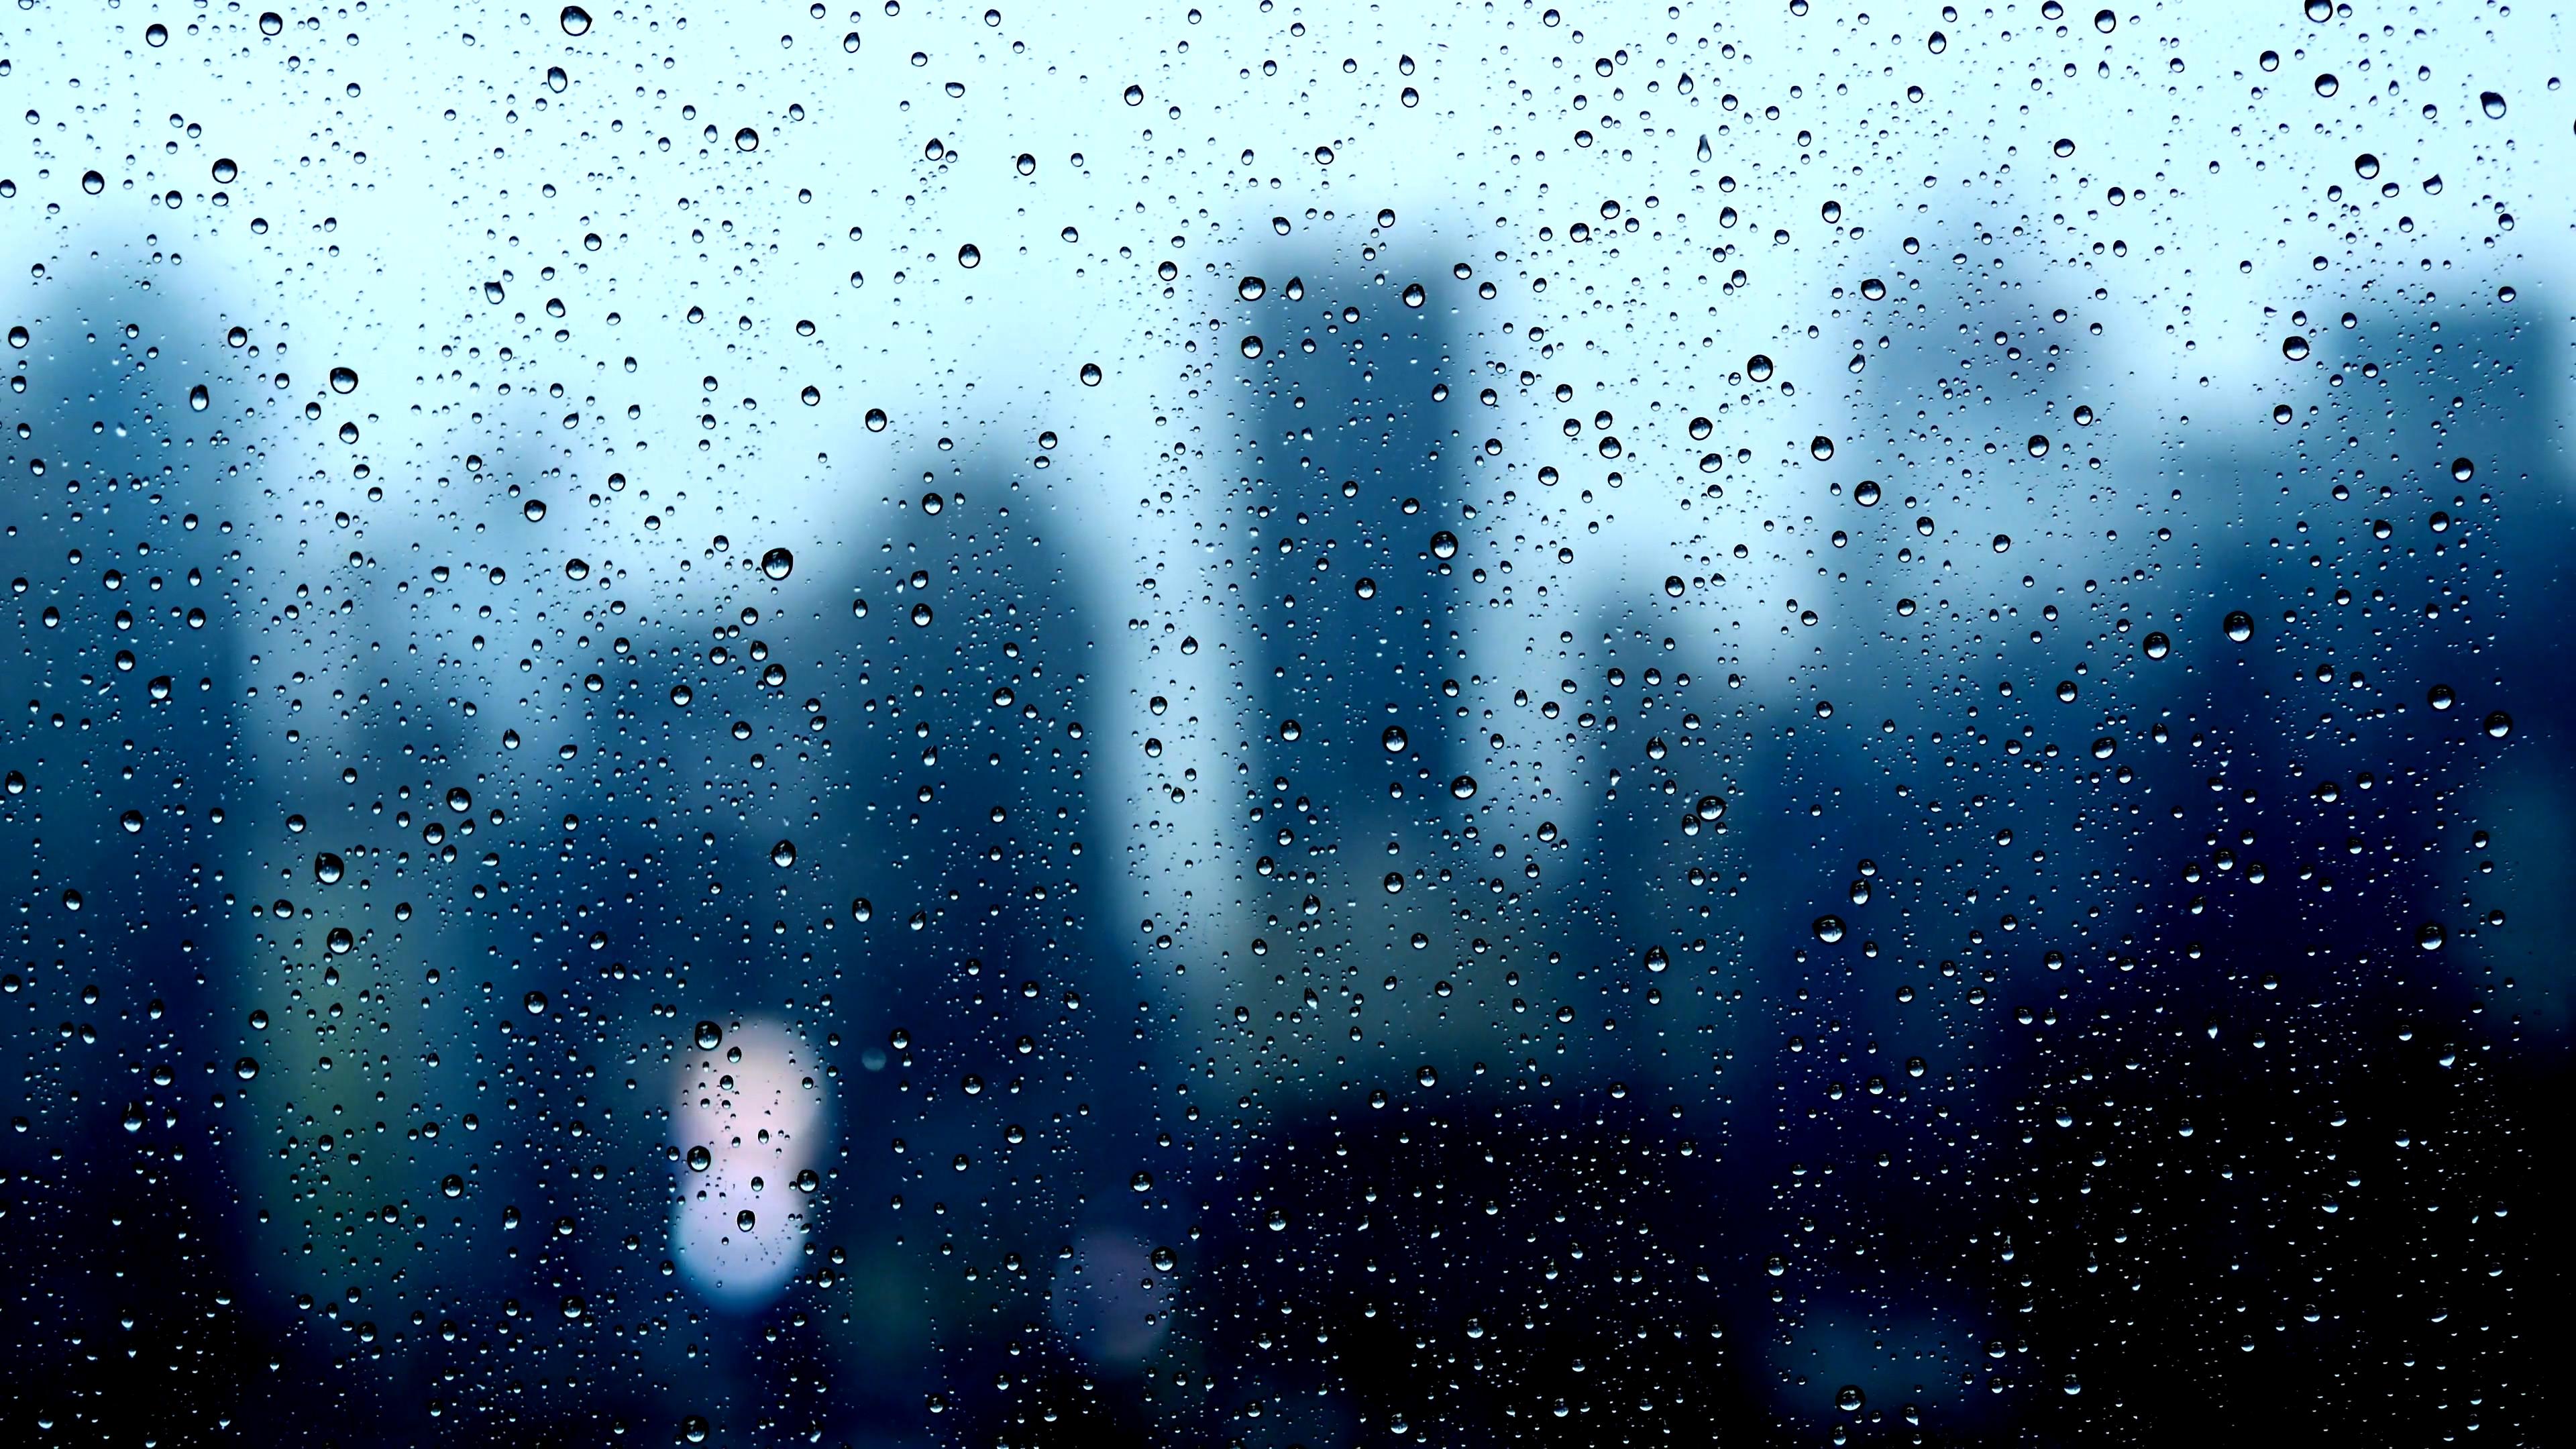 Rainy Background 57 Pictures